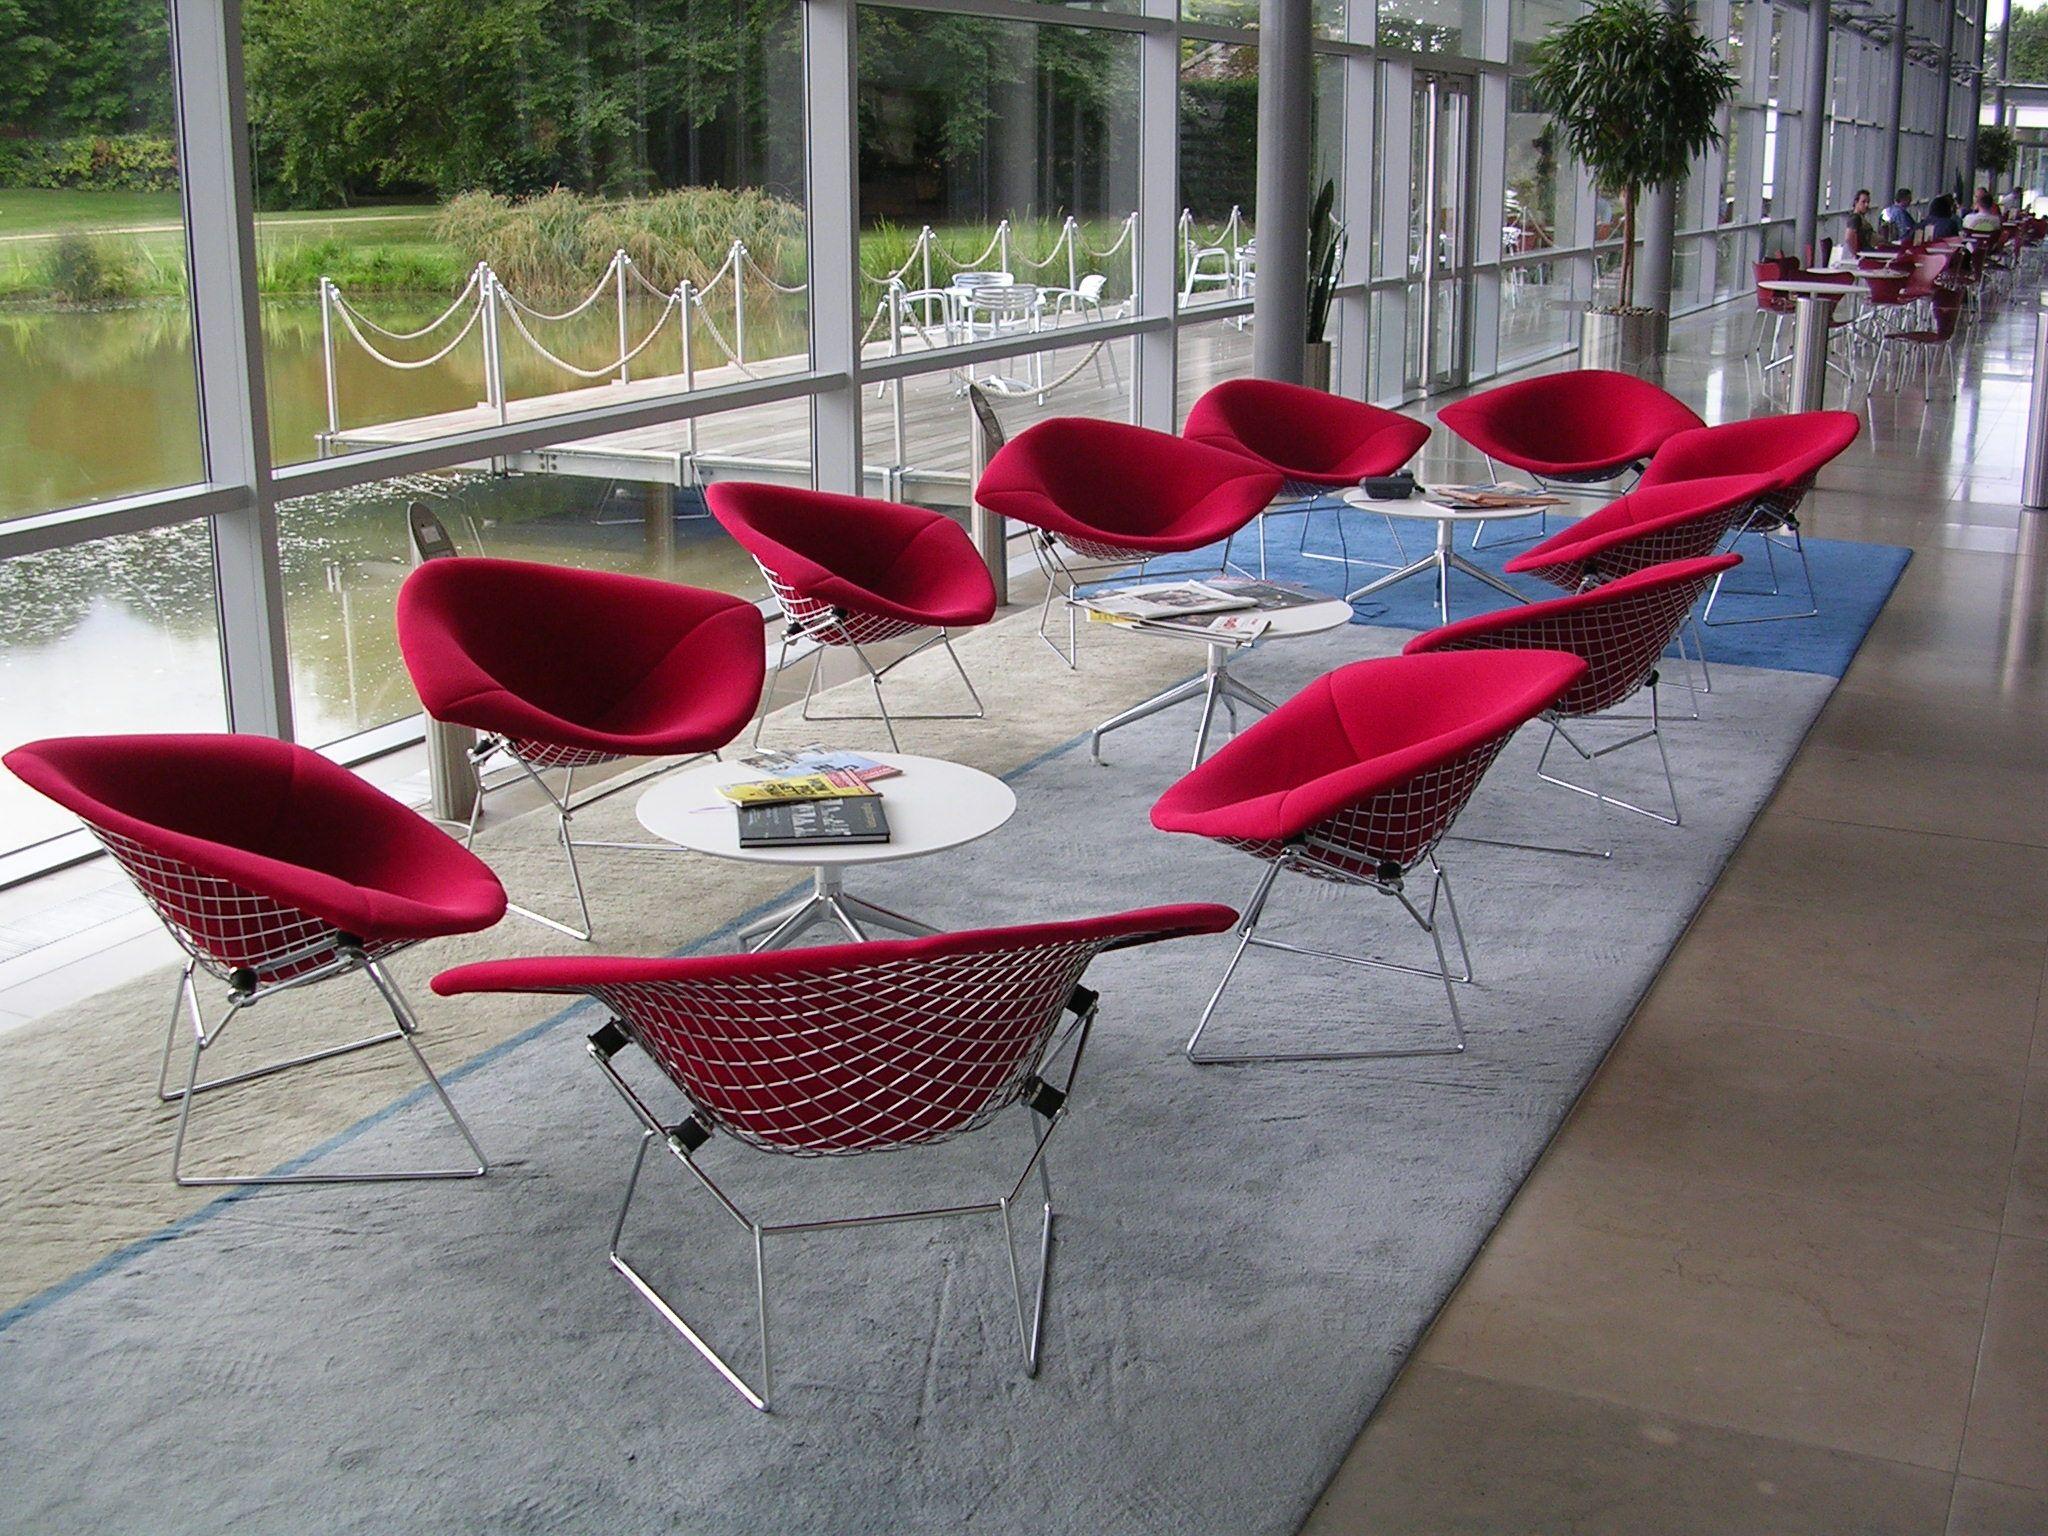 Bertoia diamond chair dimensions - Knoll Bertoia Diamond Chairs